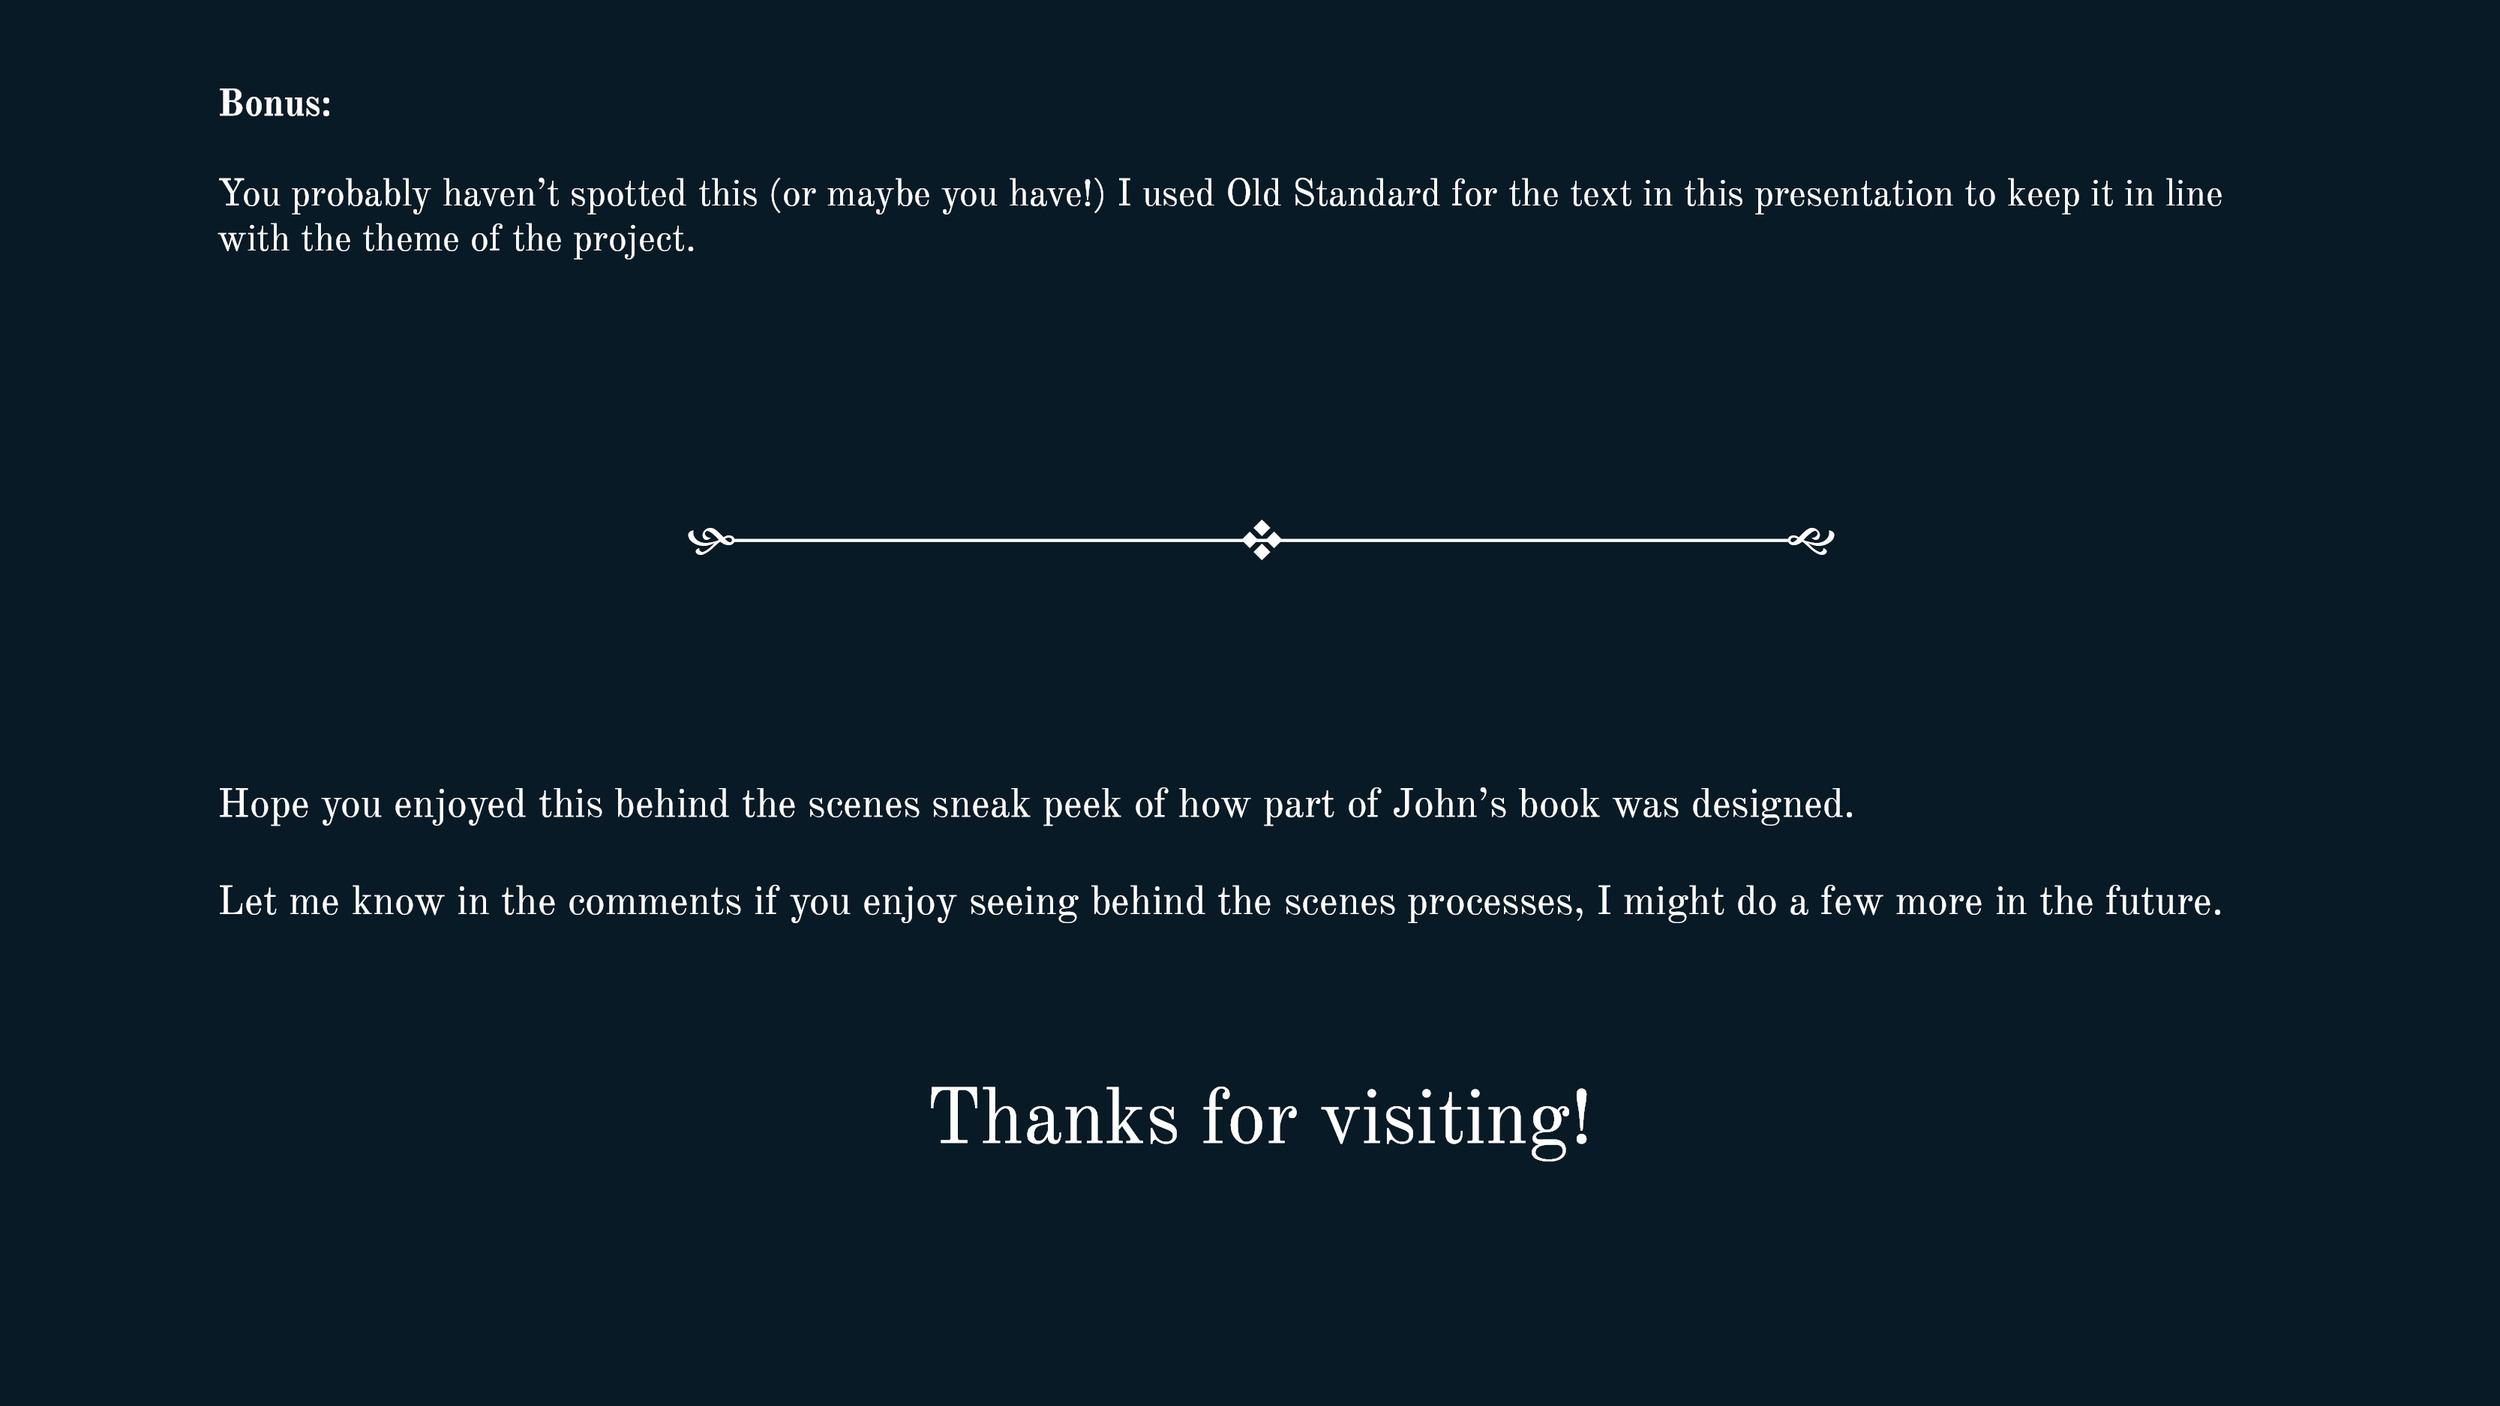 Thanks for visiting website version.jpg